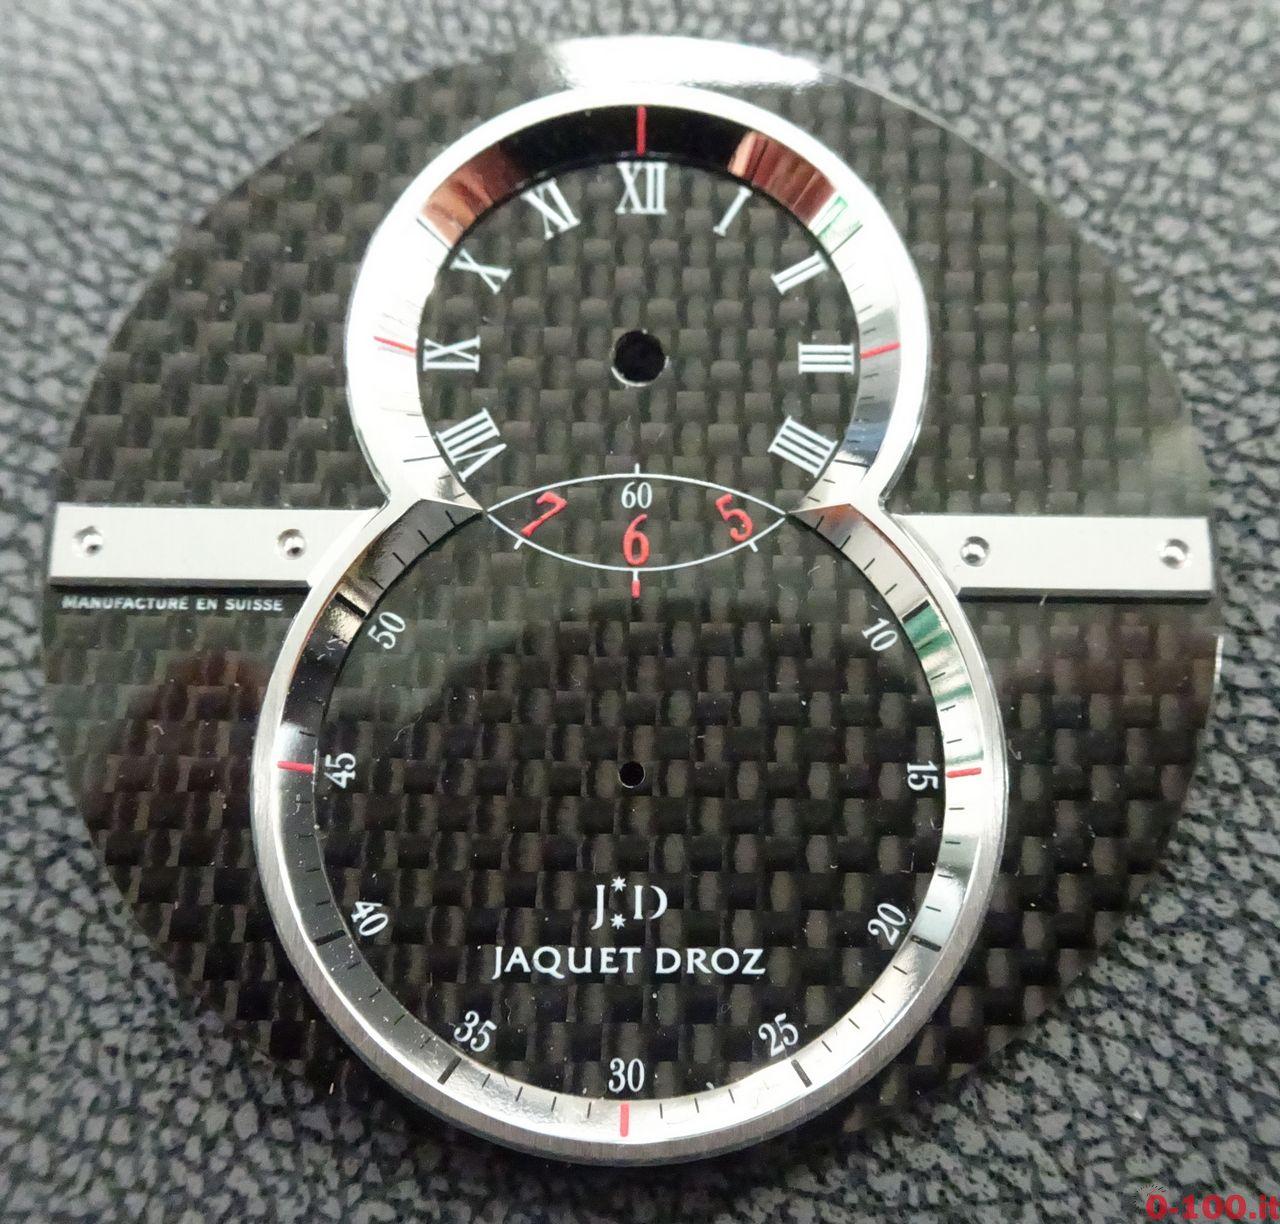 gli-speciali-di-0-100-it-jaquet-droz-la-manifattura-di-la-chaux-de-fonds_0-10042